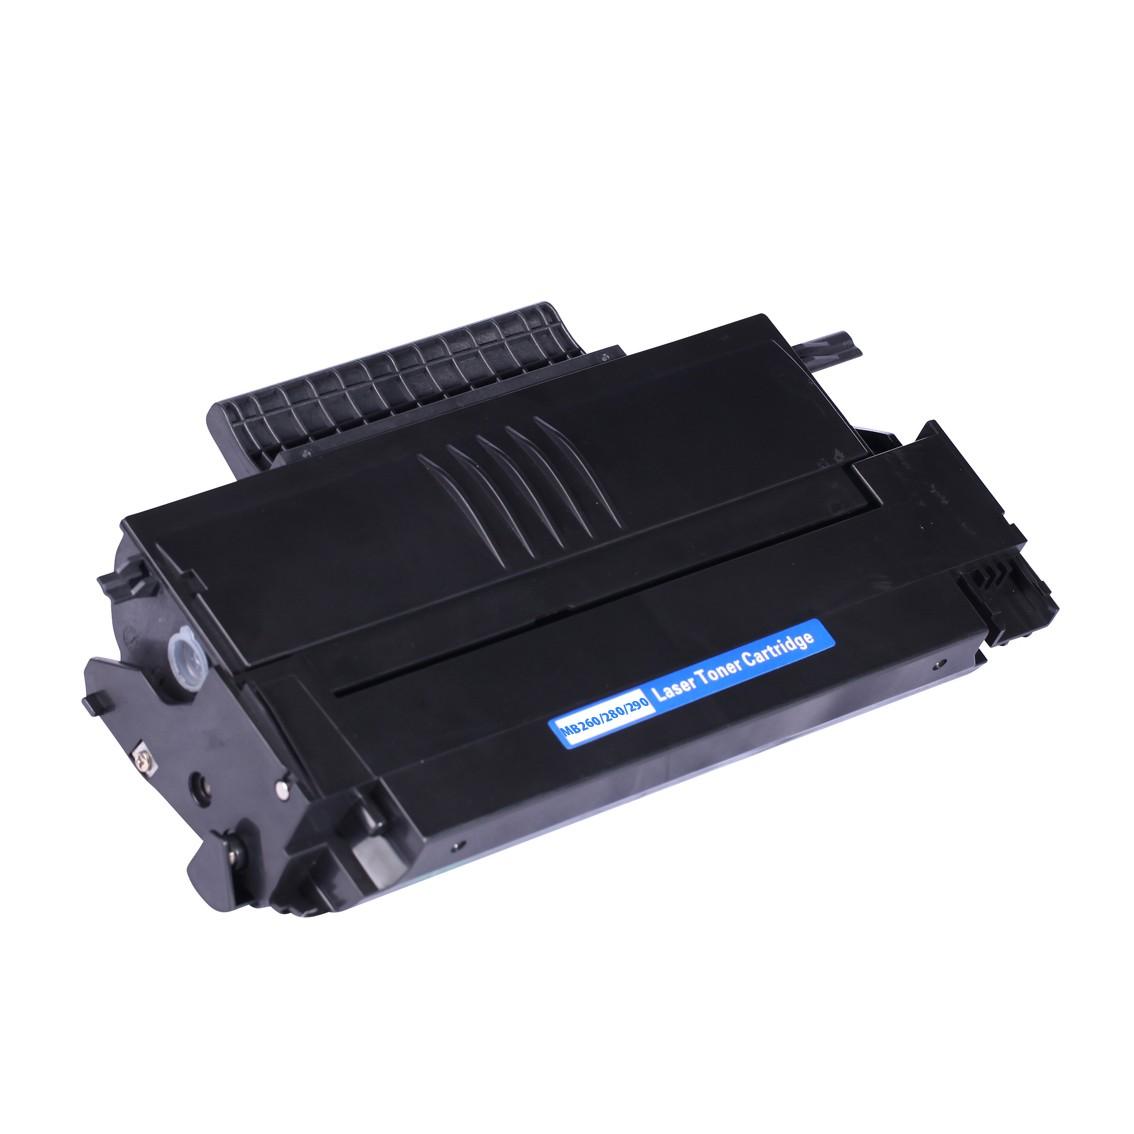 Image of   OKI MB260/280/290 (1240001) Lasertoner, sort, Kompatibel, 5500 sider